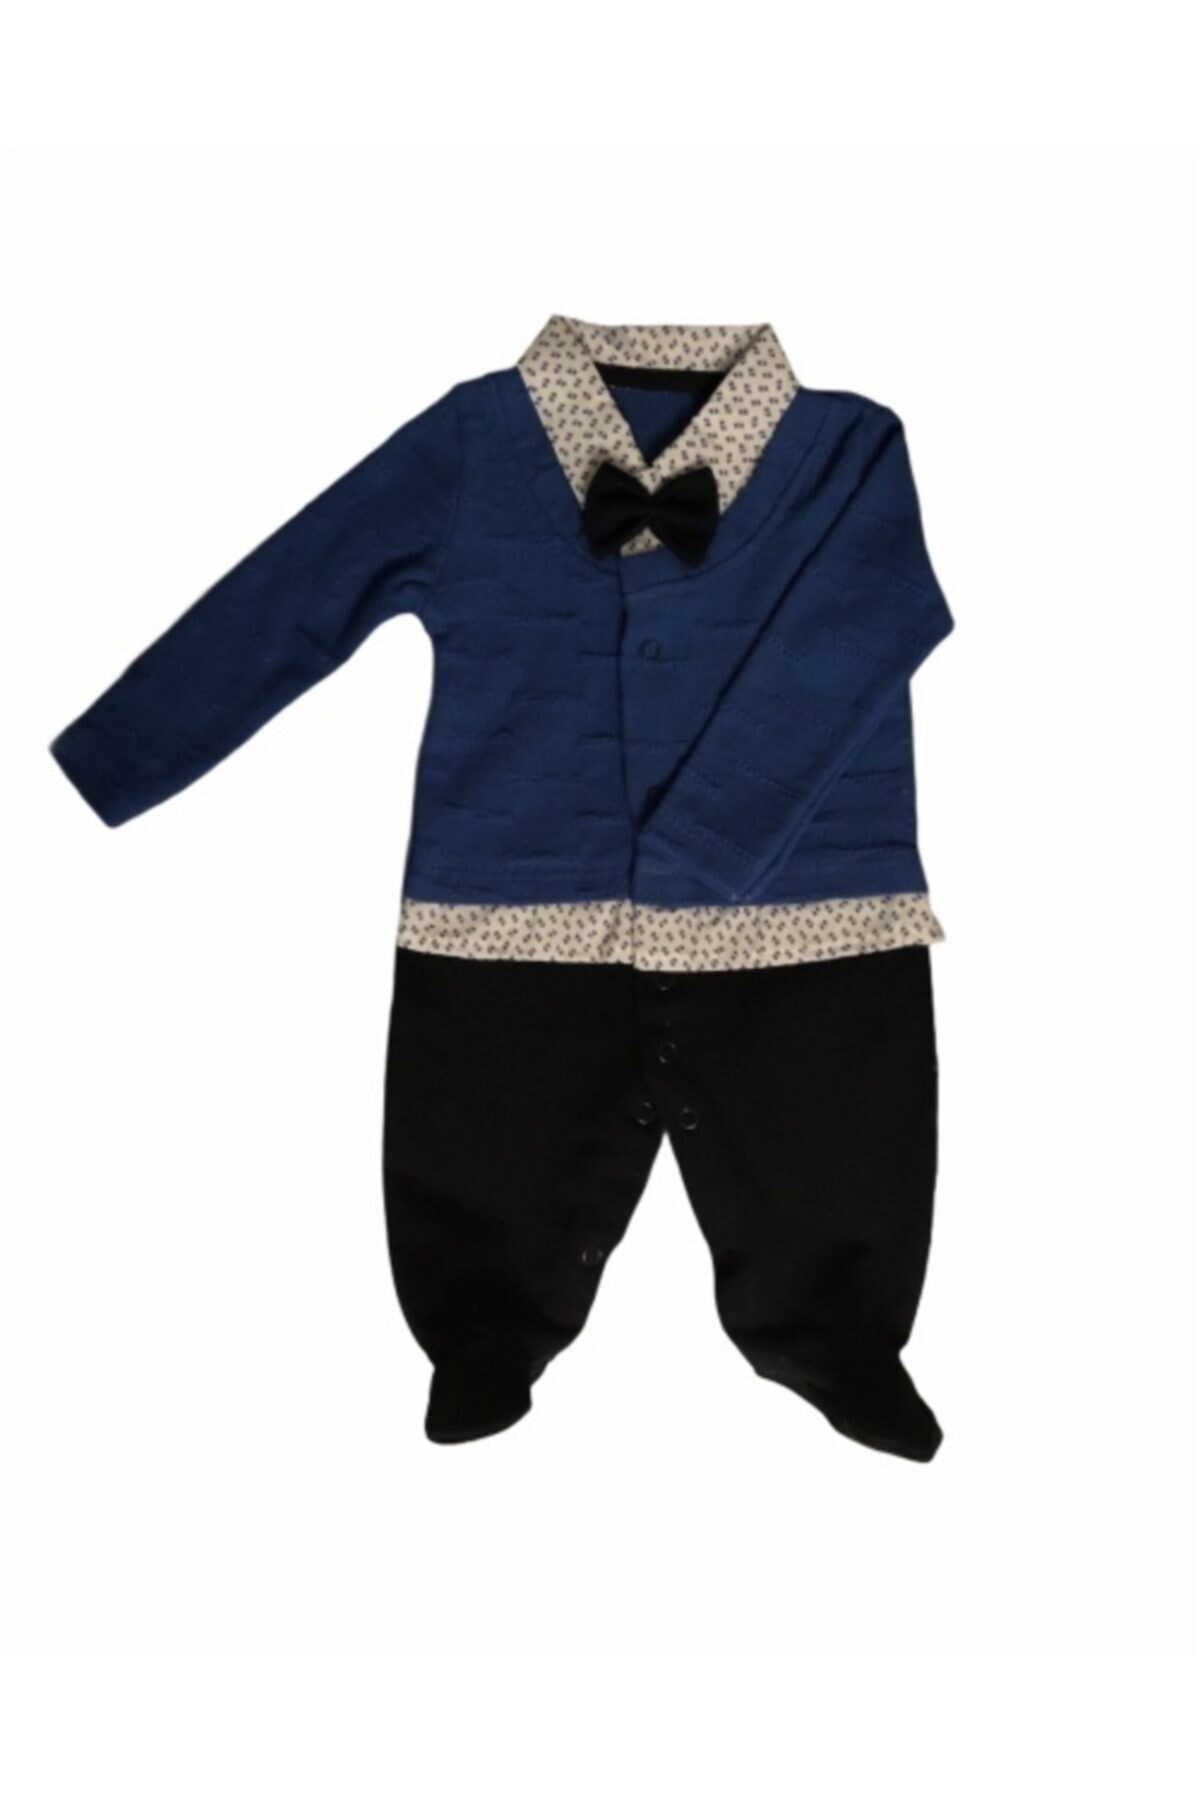 Necix's Erkek Bebek Mavi Papyonlu Patikli Tulum 2